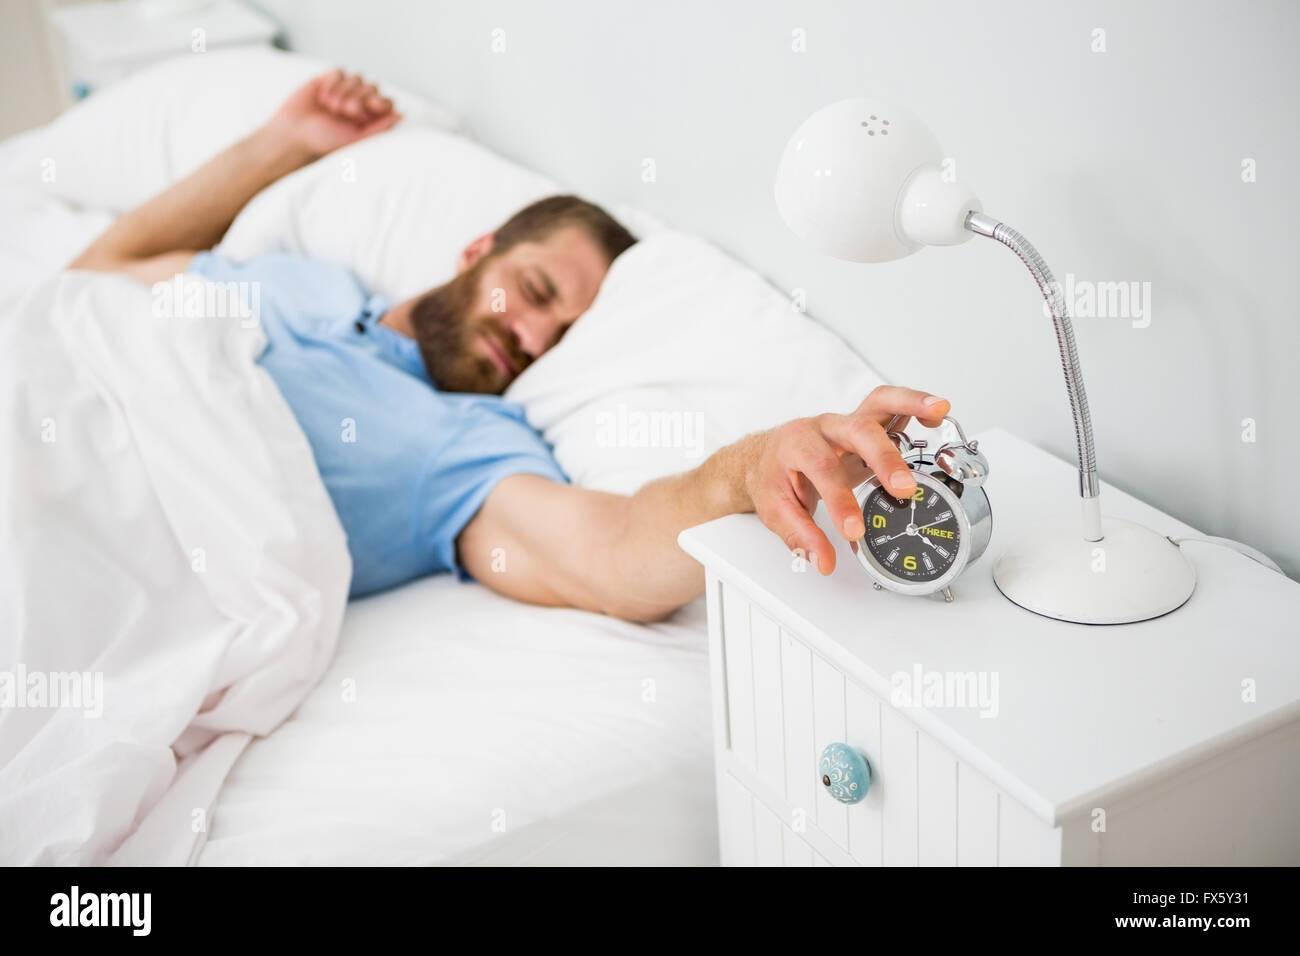 Sleeping man awakened by a alarm on bed - Stock Image